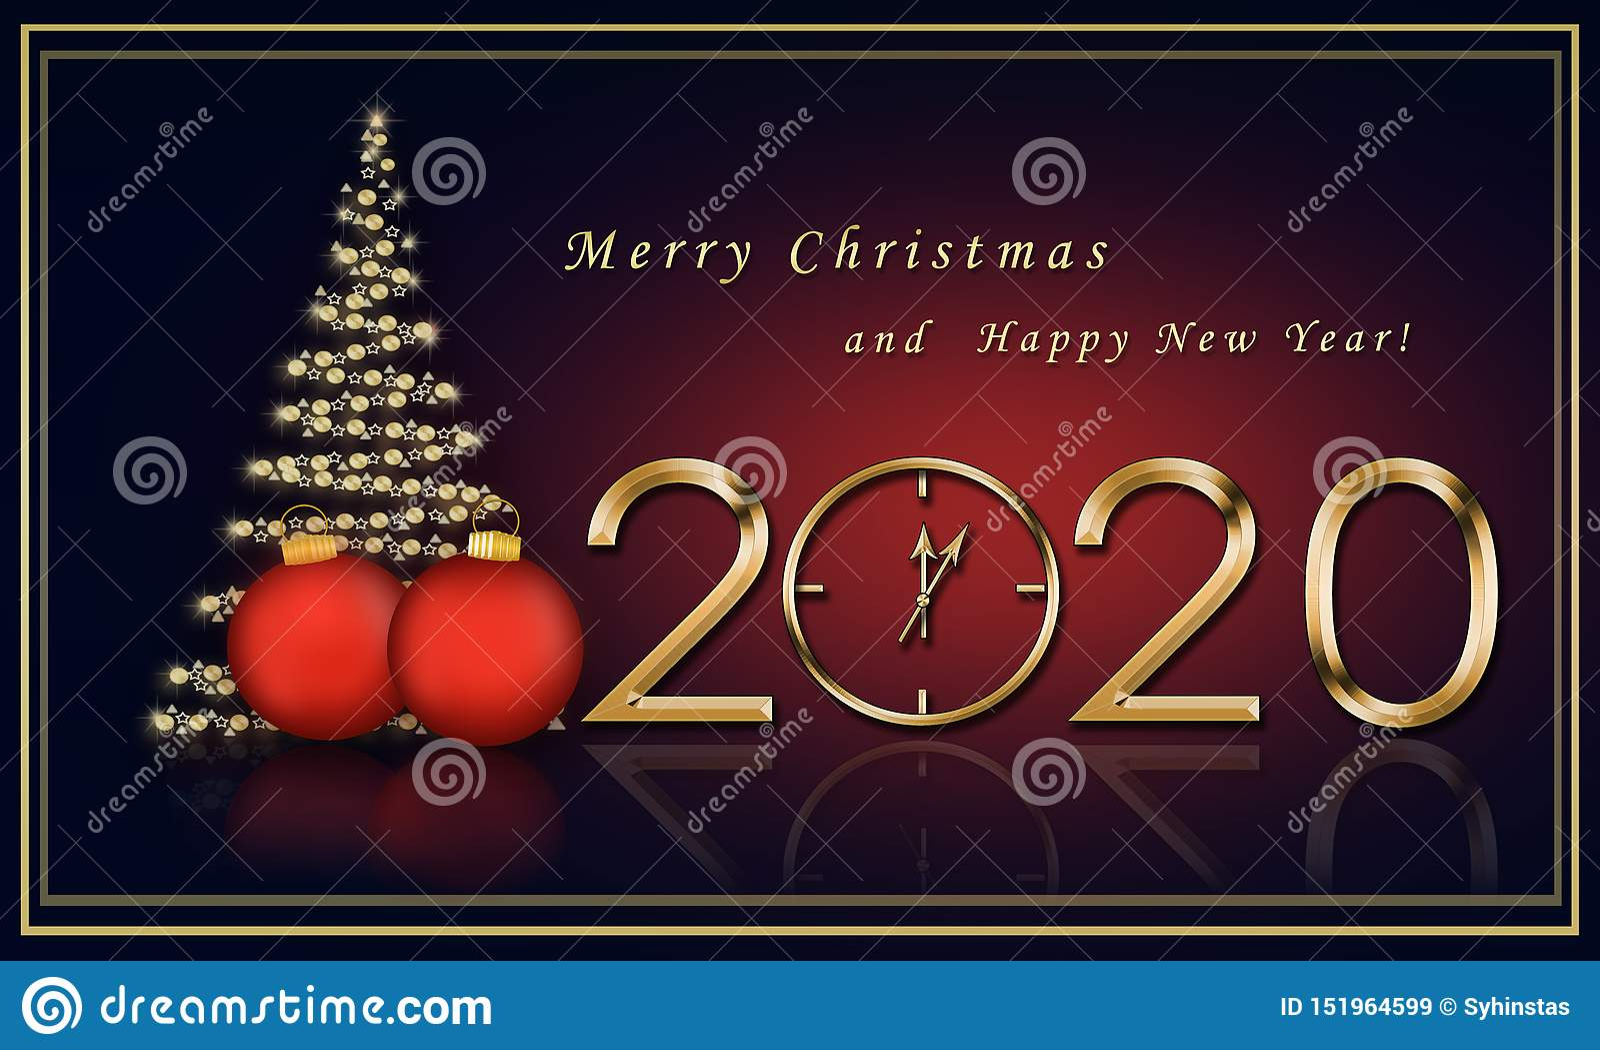 Christmas Card Images 2020 Christmas Card 2020 With A Christmas Tree Stock Illustration